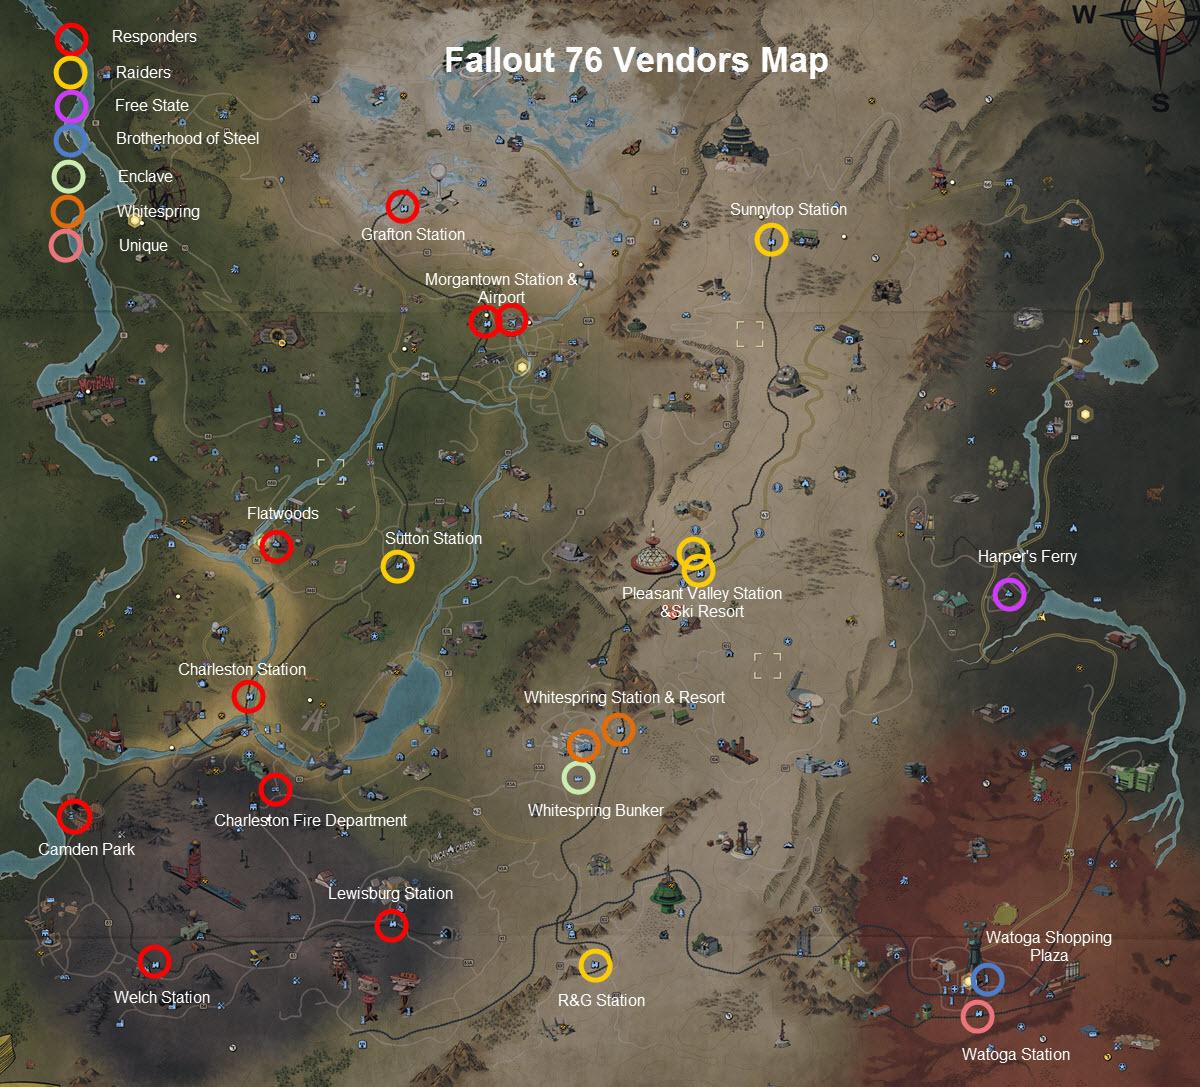 fallout-76-vendor-map-2.jpg